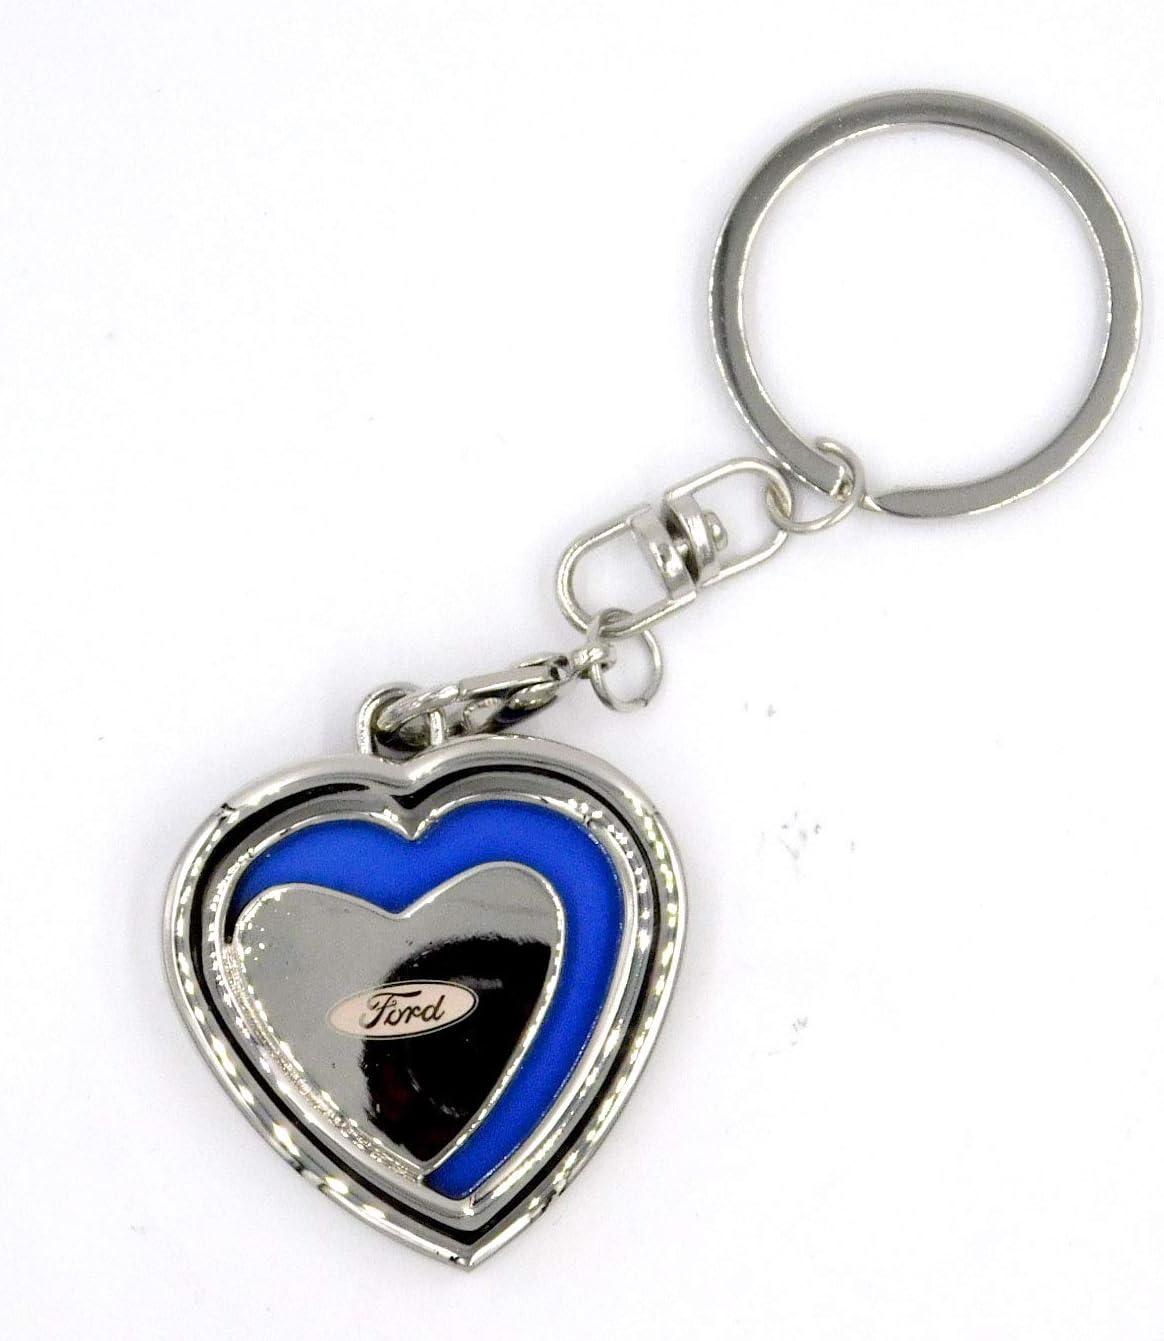 Ford Key Ring Metal Chrome Car Logo Stainless Key Chain Keyring Key Fob New Blue